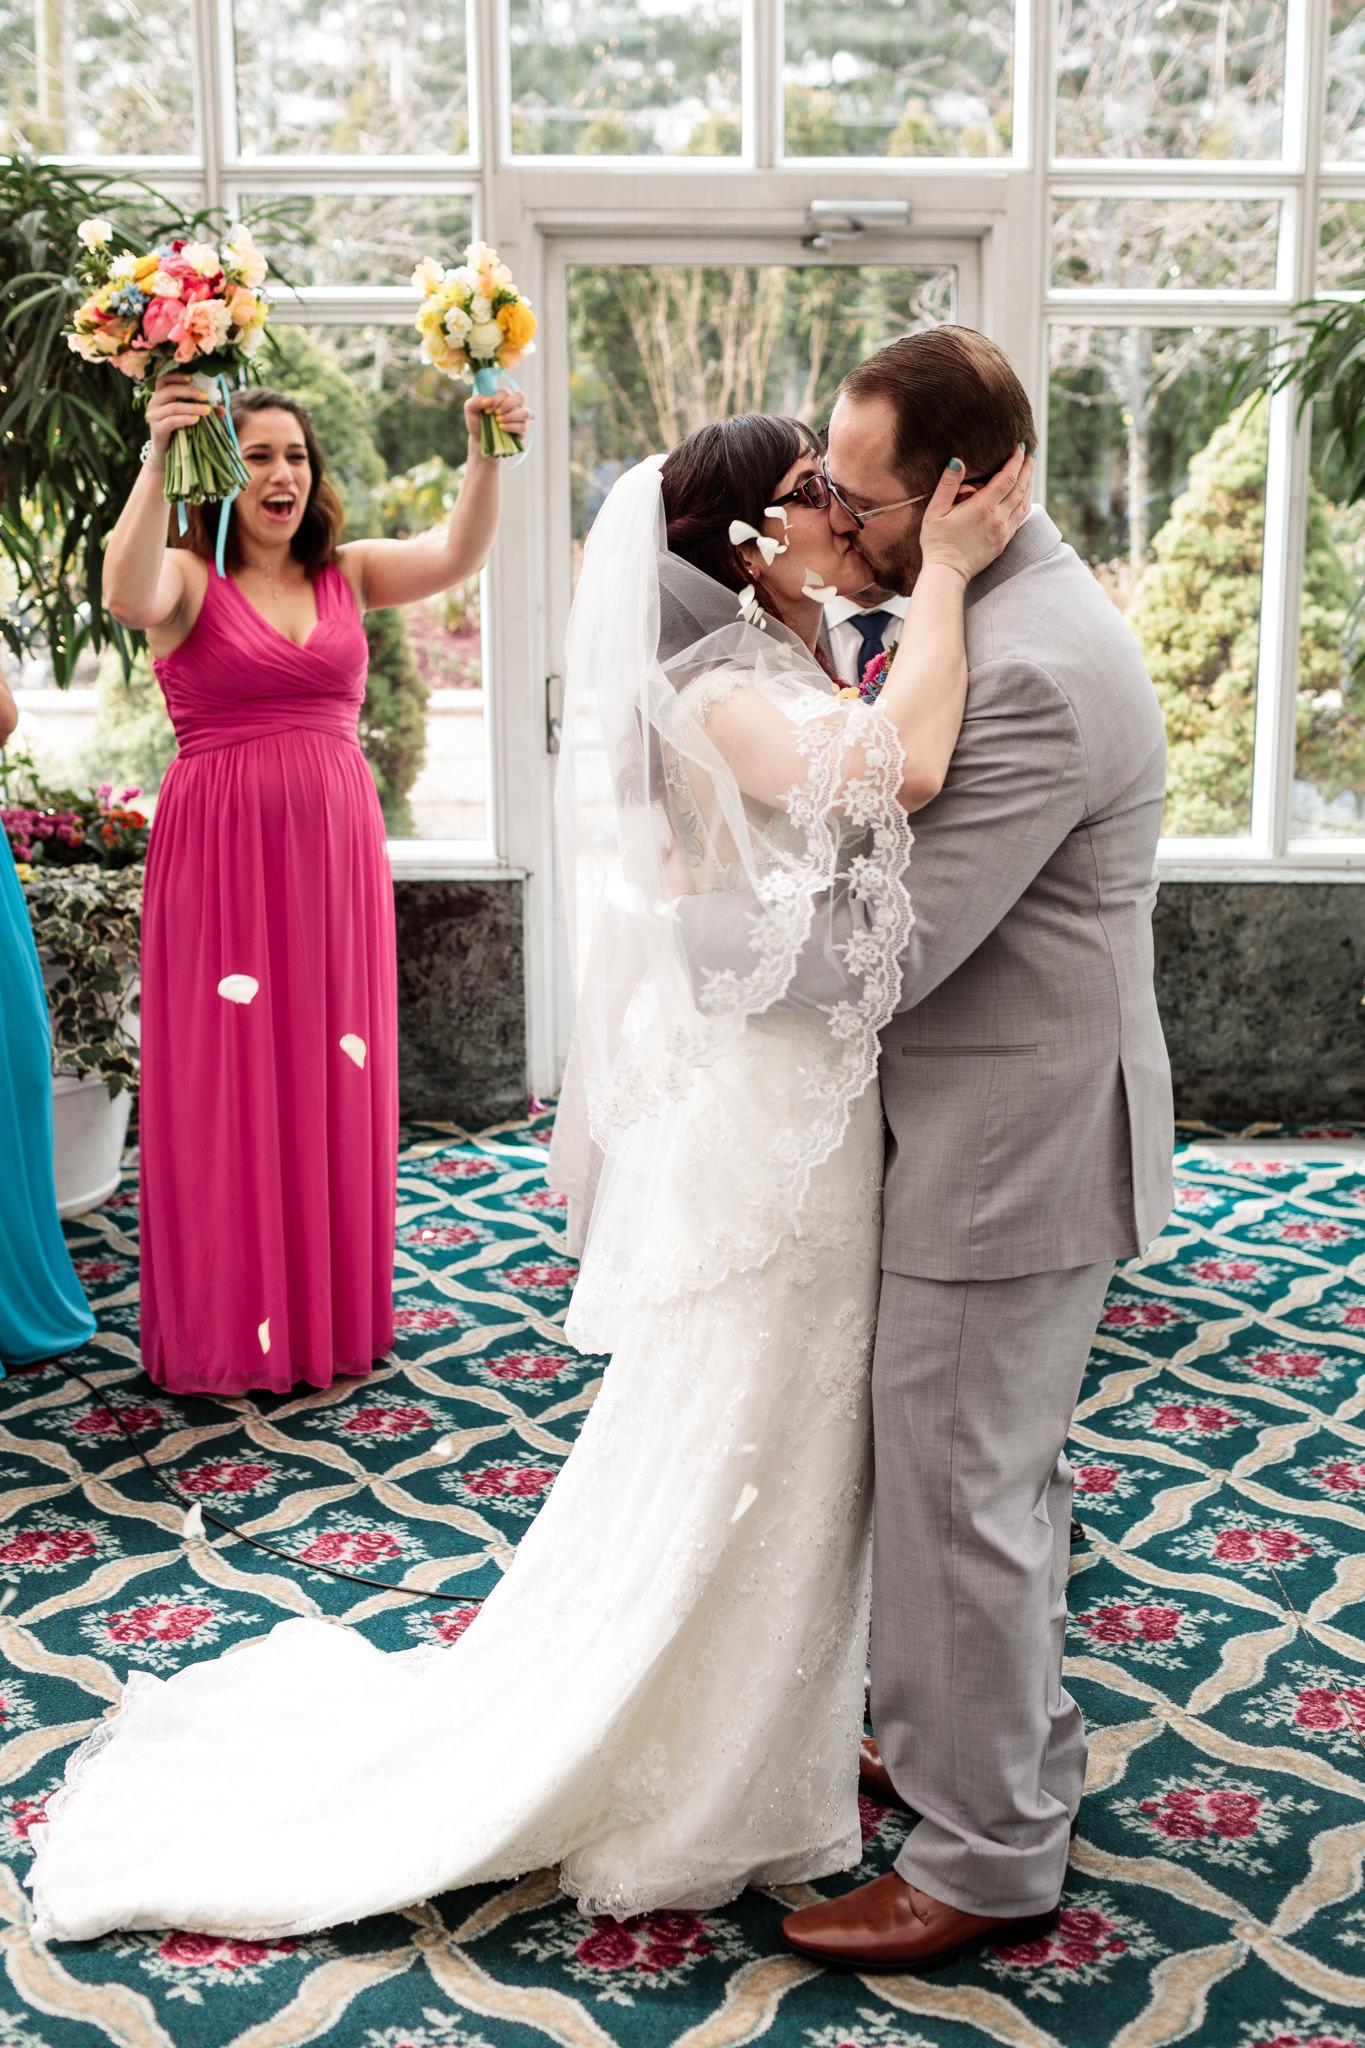 Hanchar_Madison_Hotel_NJ_Wedding_7R5A8311.jpg